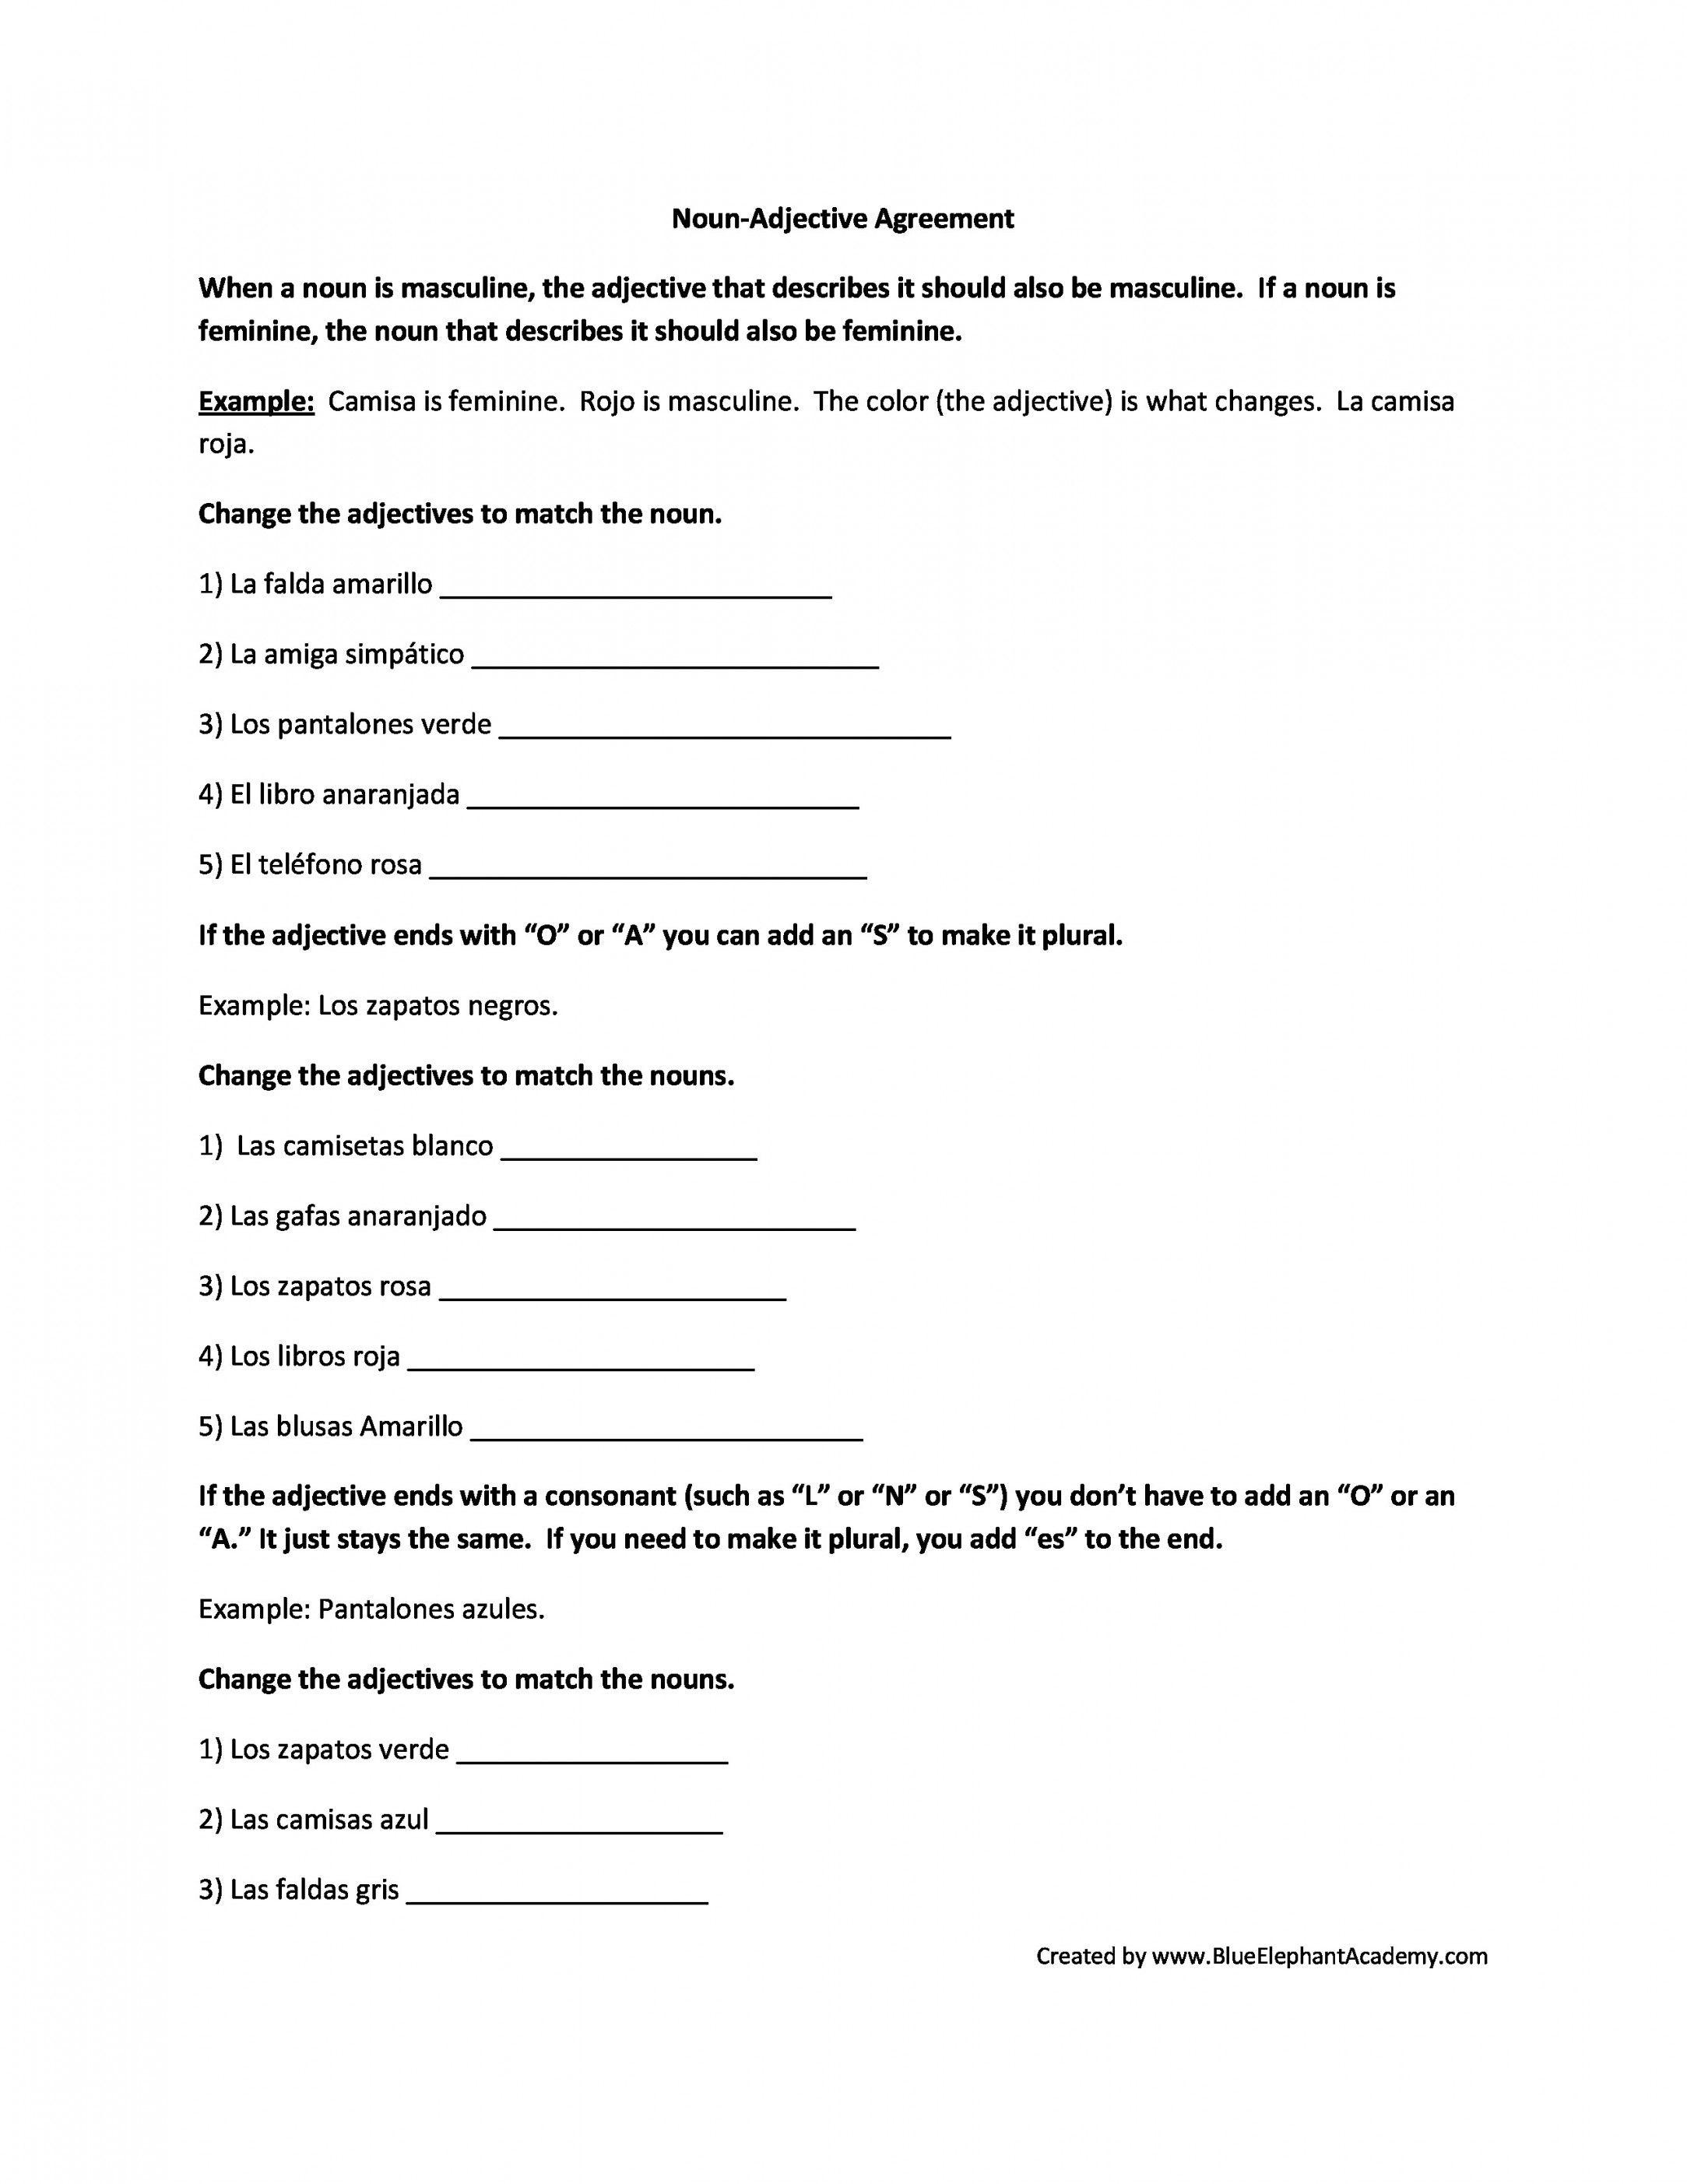 Free Printable Spanish Worksheets For Beginners   Lostranquillos - Free Printable Spanish Worksheets